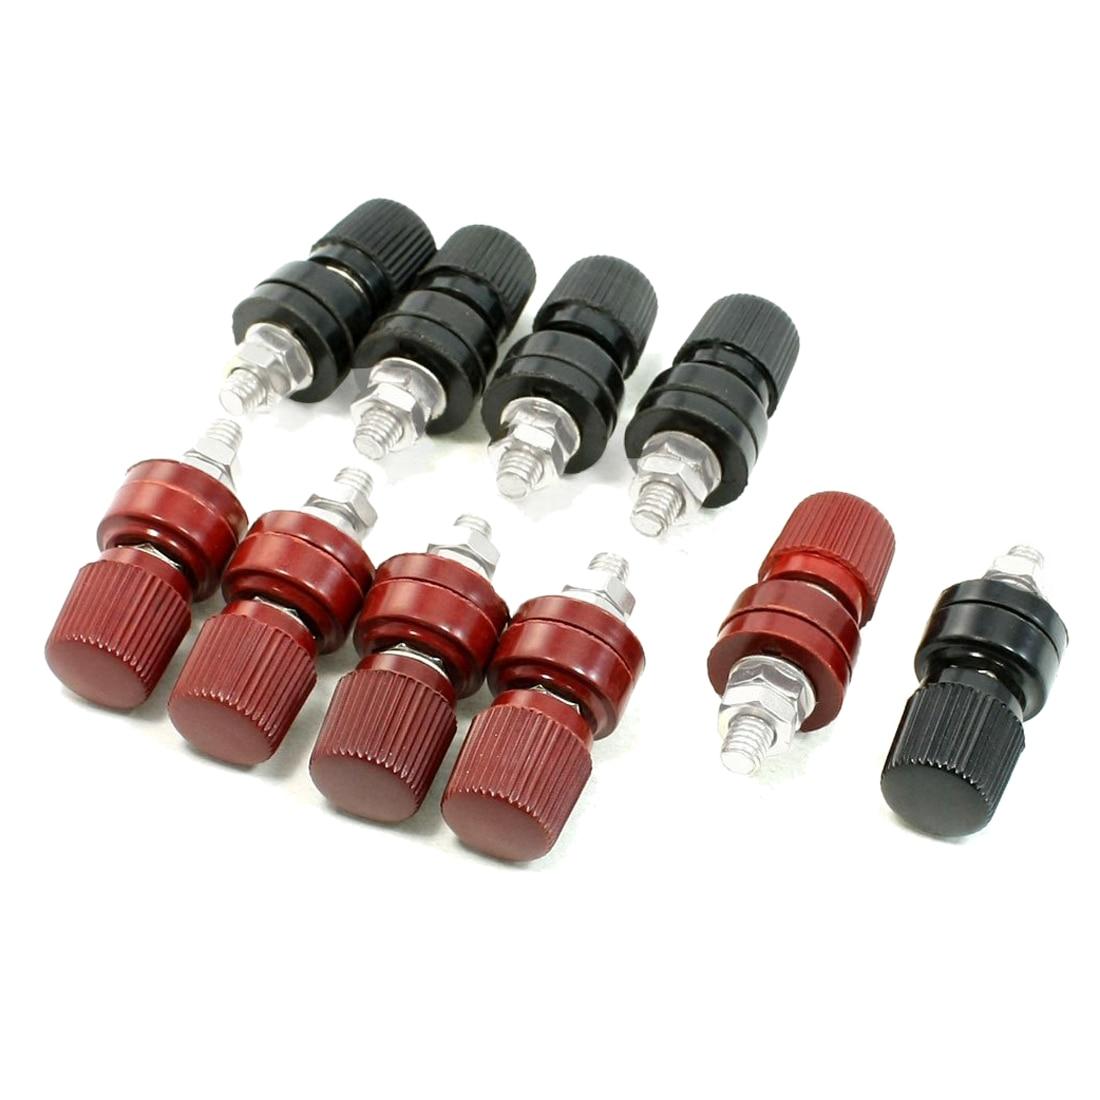 CNIM Hot 5.7mm Thread Dia Dark Red Black Plastic Metal Binding Post Terminal 10 Pcs bookcase 60 h dark taupe black metal 7241